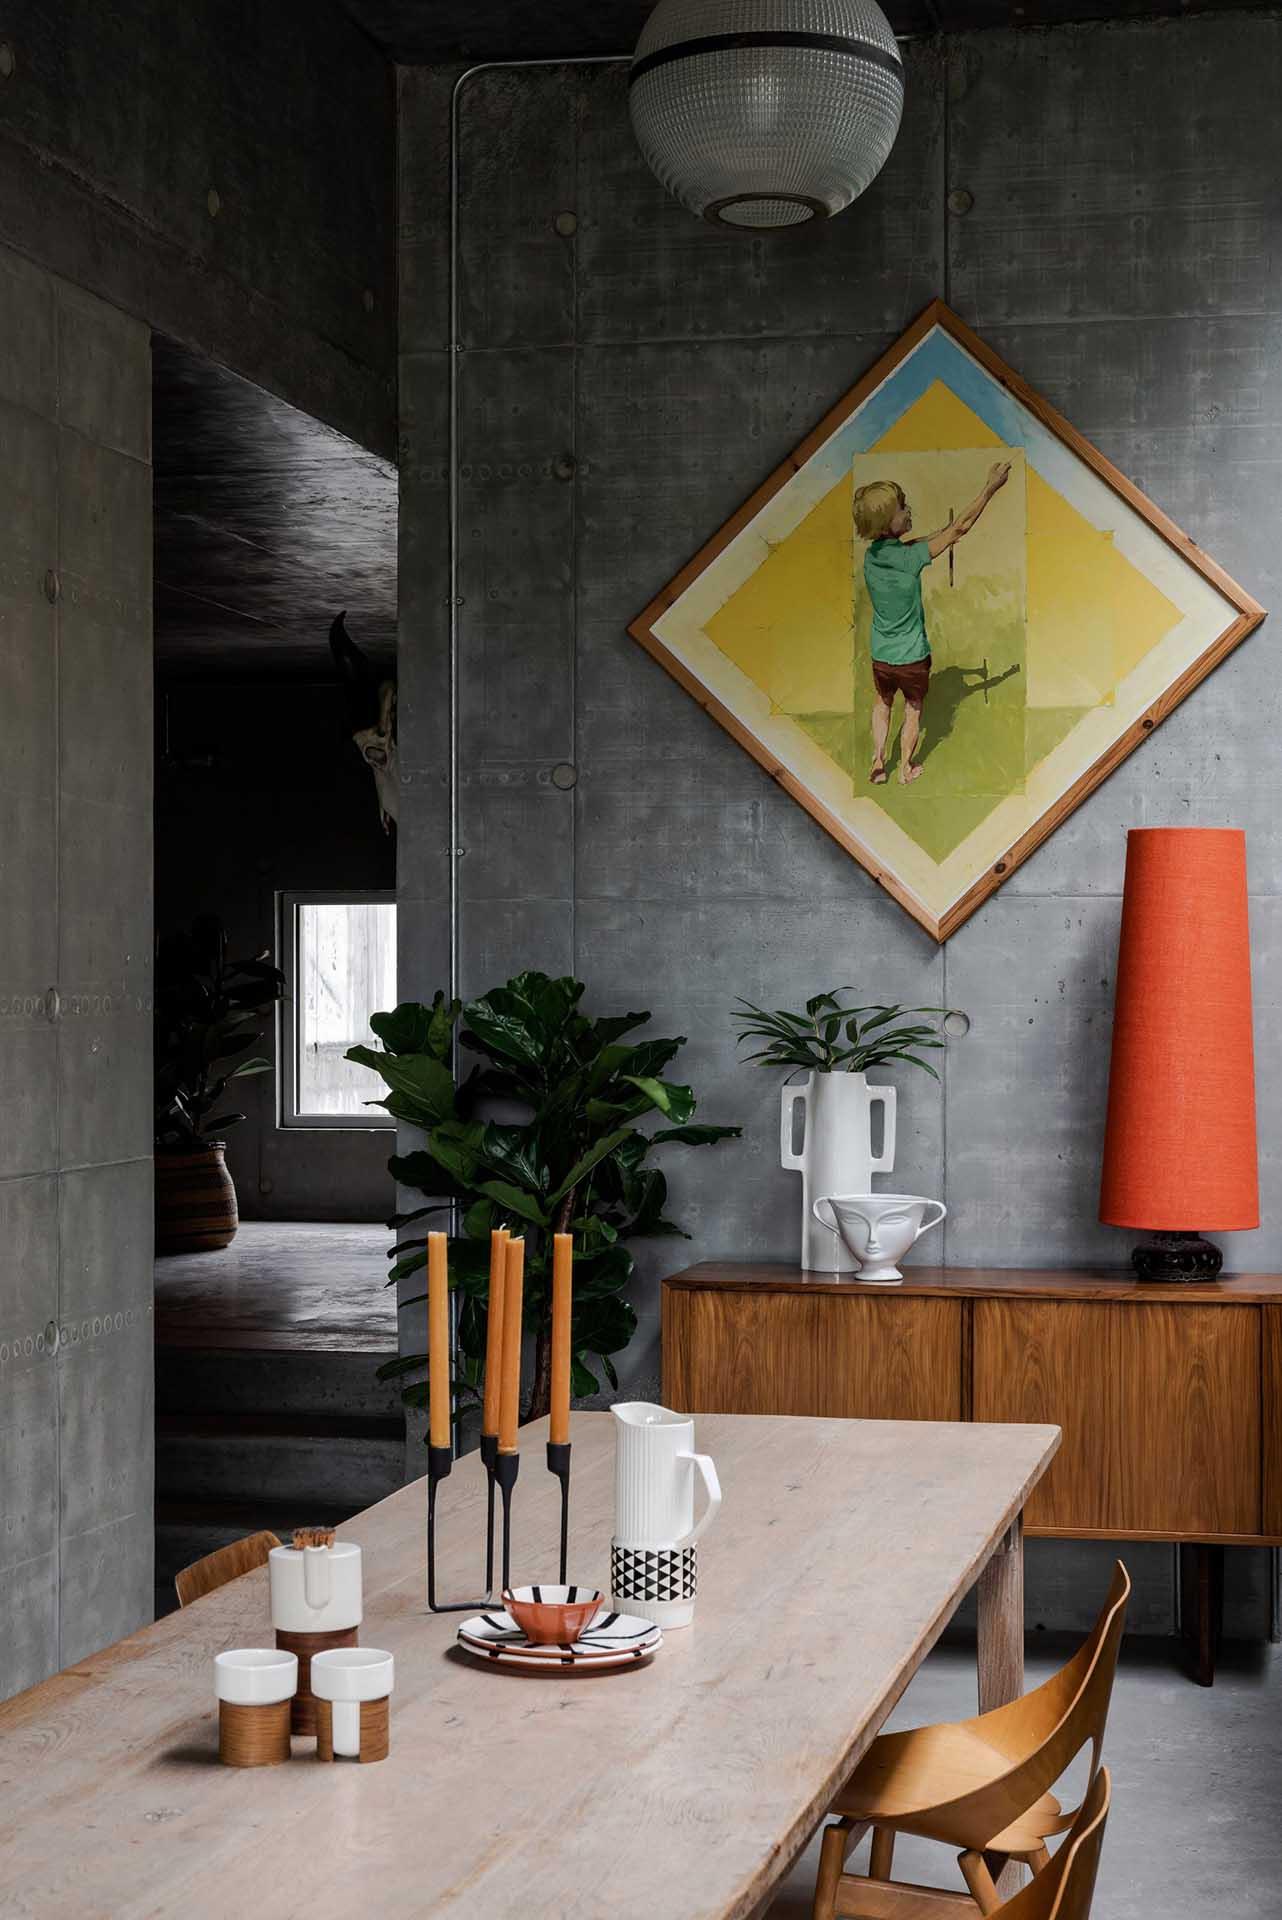 concrete-house-raw-architecture-workshop-tarry-perry_dezeen_8